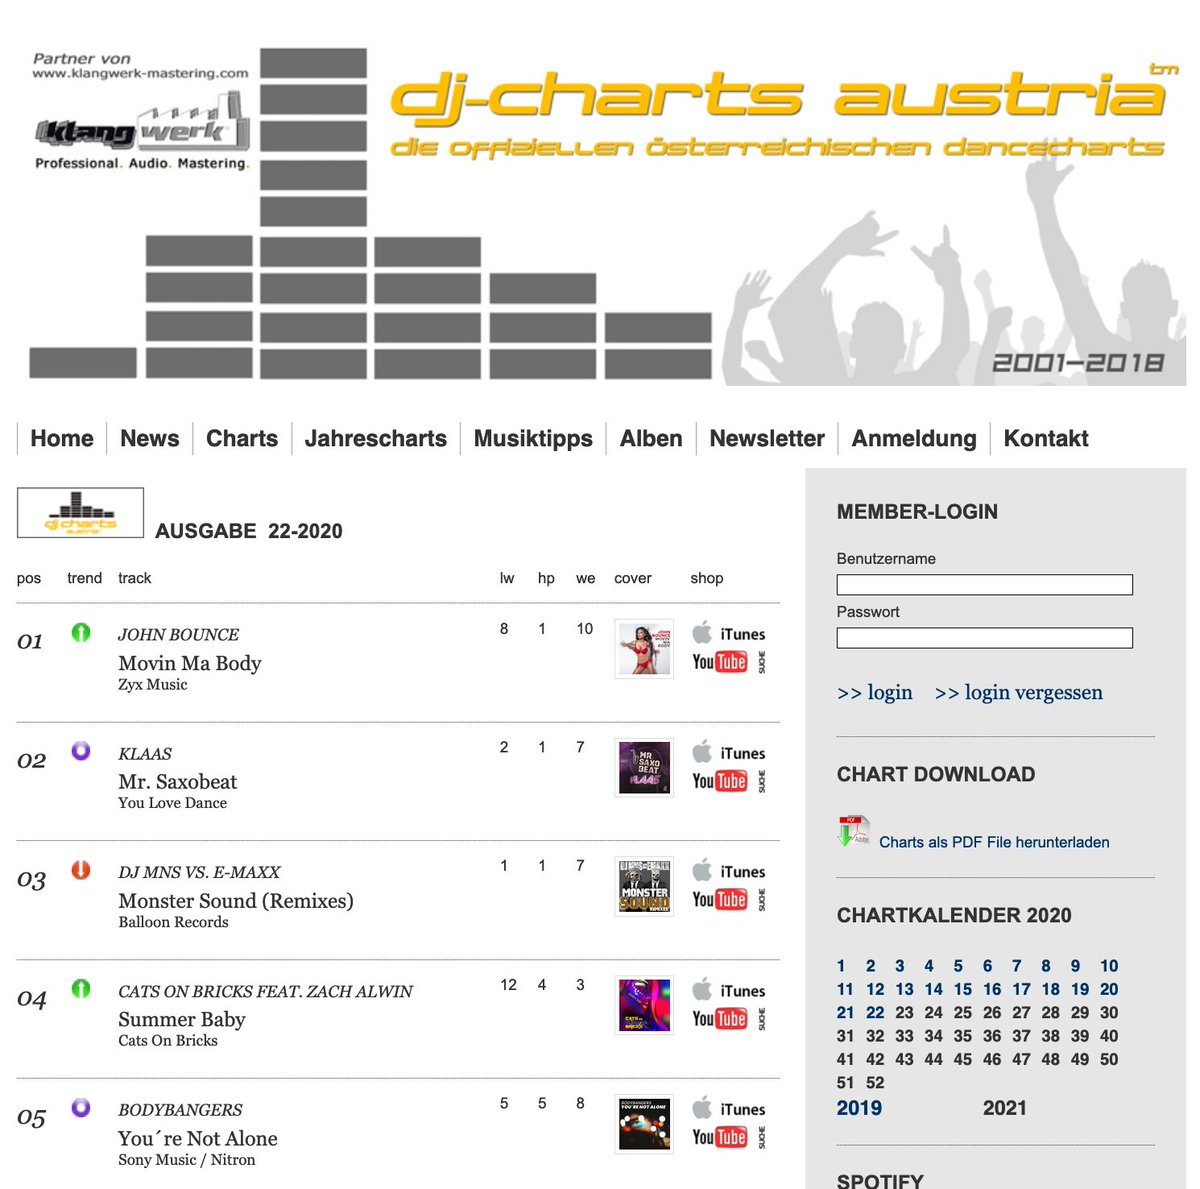 Vielen Dank für den Support / Thanks for you Support #MovinMaBody #JohnBounce #dj #charts #austria auf #Platz1 #zyx #zyxmusic #zyxdance #house #dance #edm #poppic.twitter.com/VDQjp46Itf